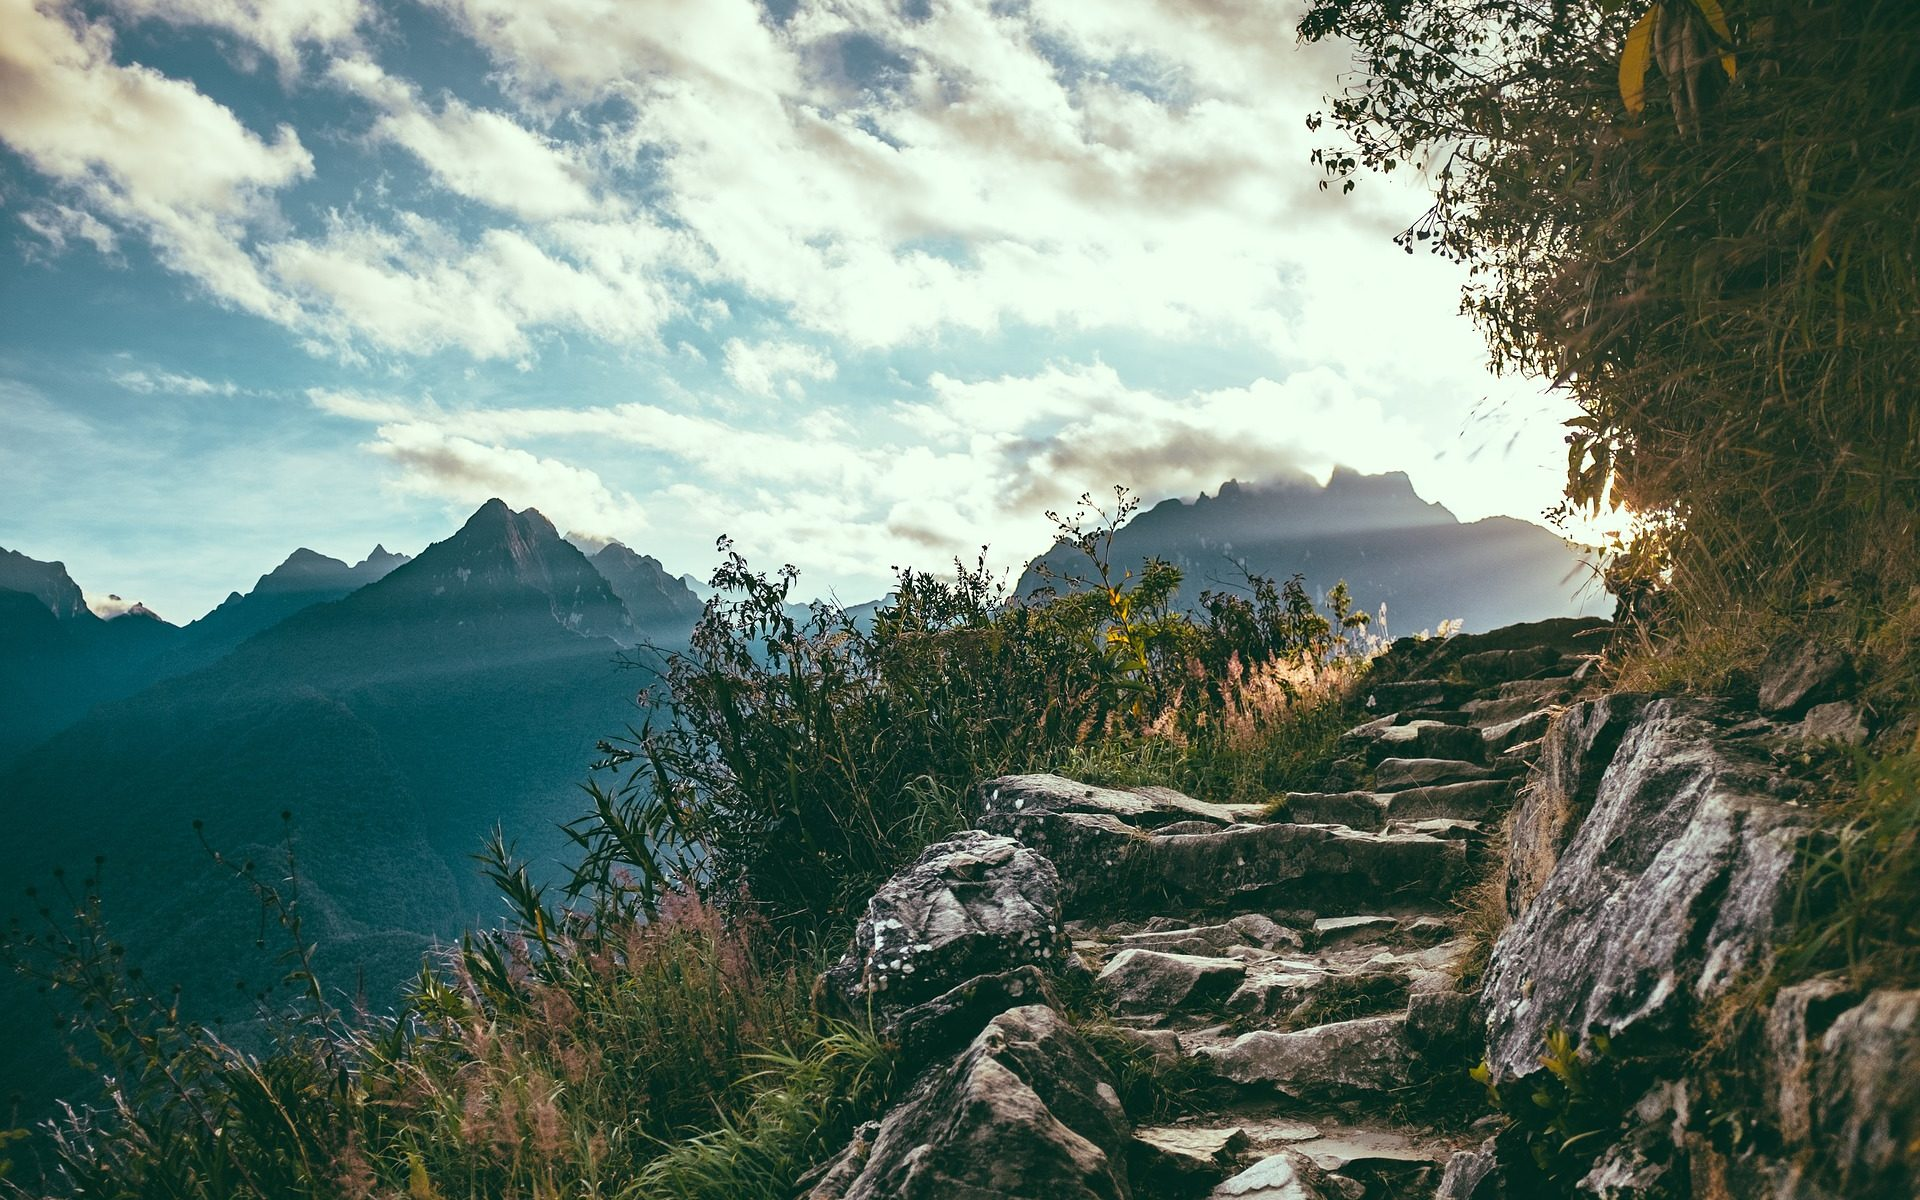 Schritt für Schritt das Abenteuer planen